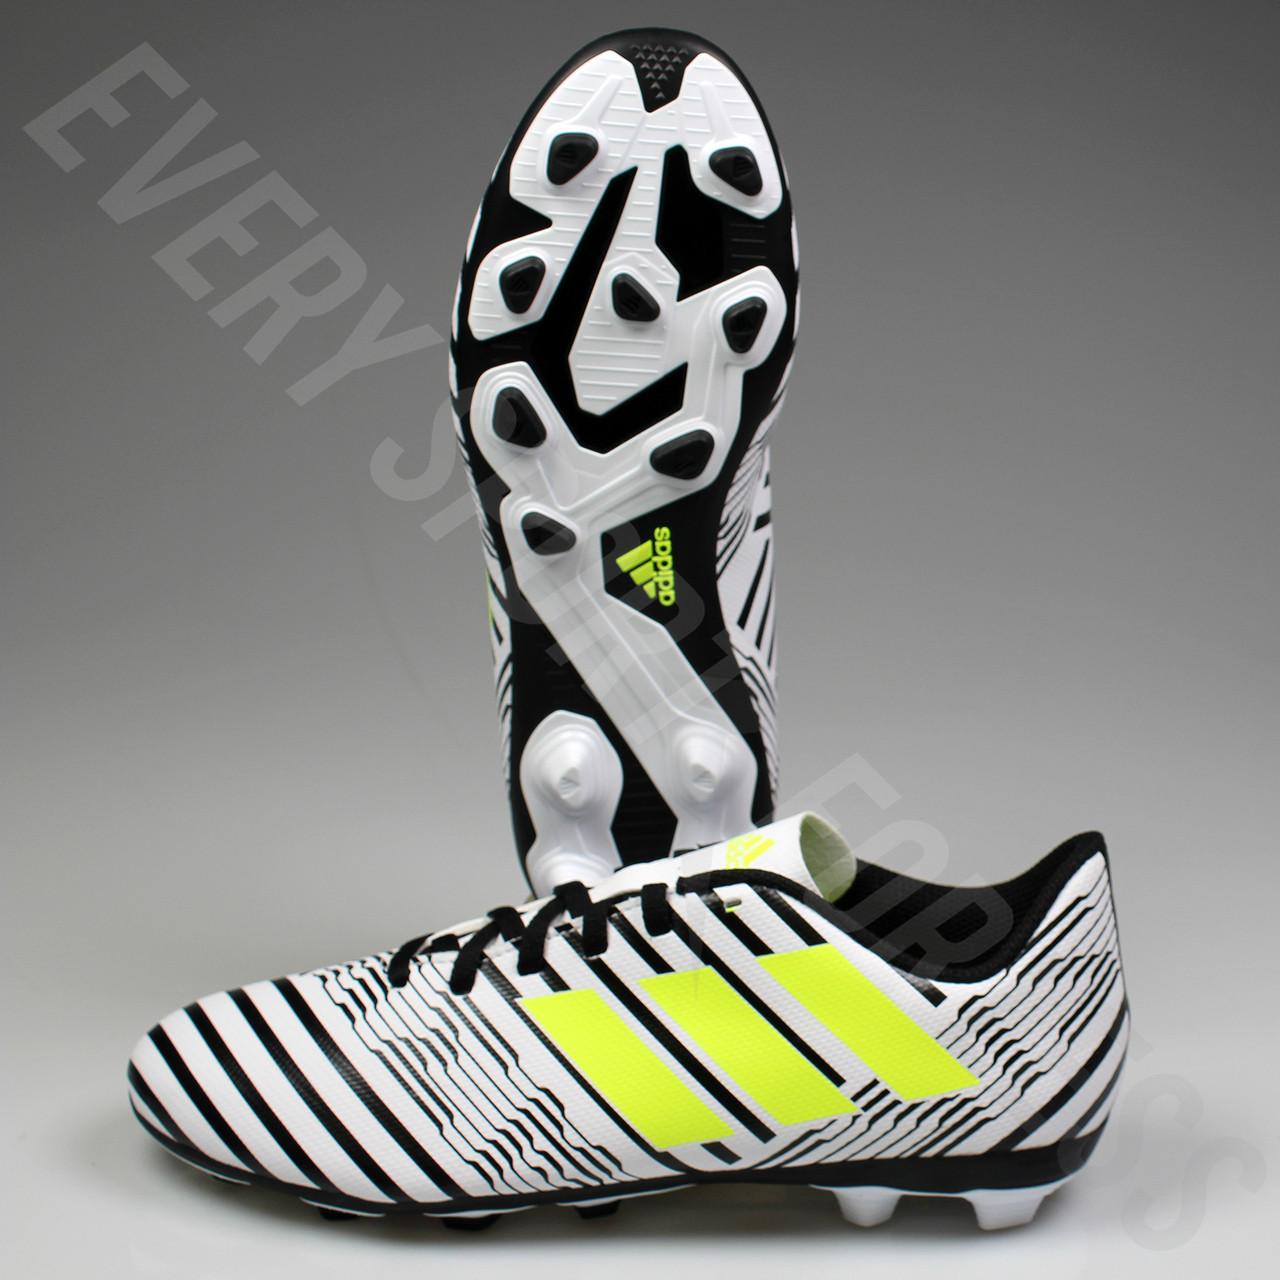 defd1468daab Adidas Nemeziz 17.4 FxG Junior Soccer Cleats S82459 - White Solar ...